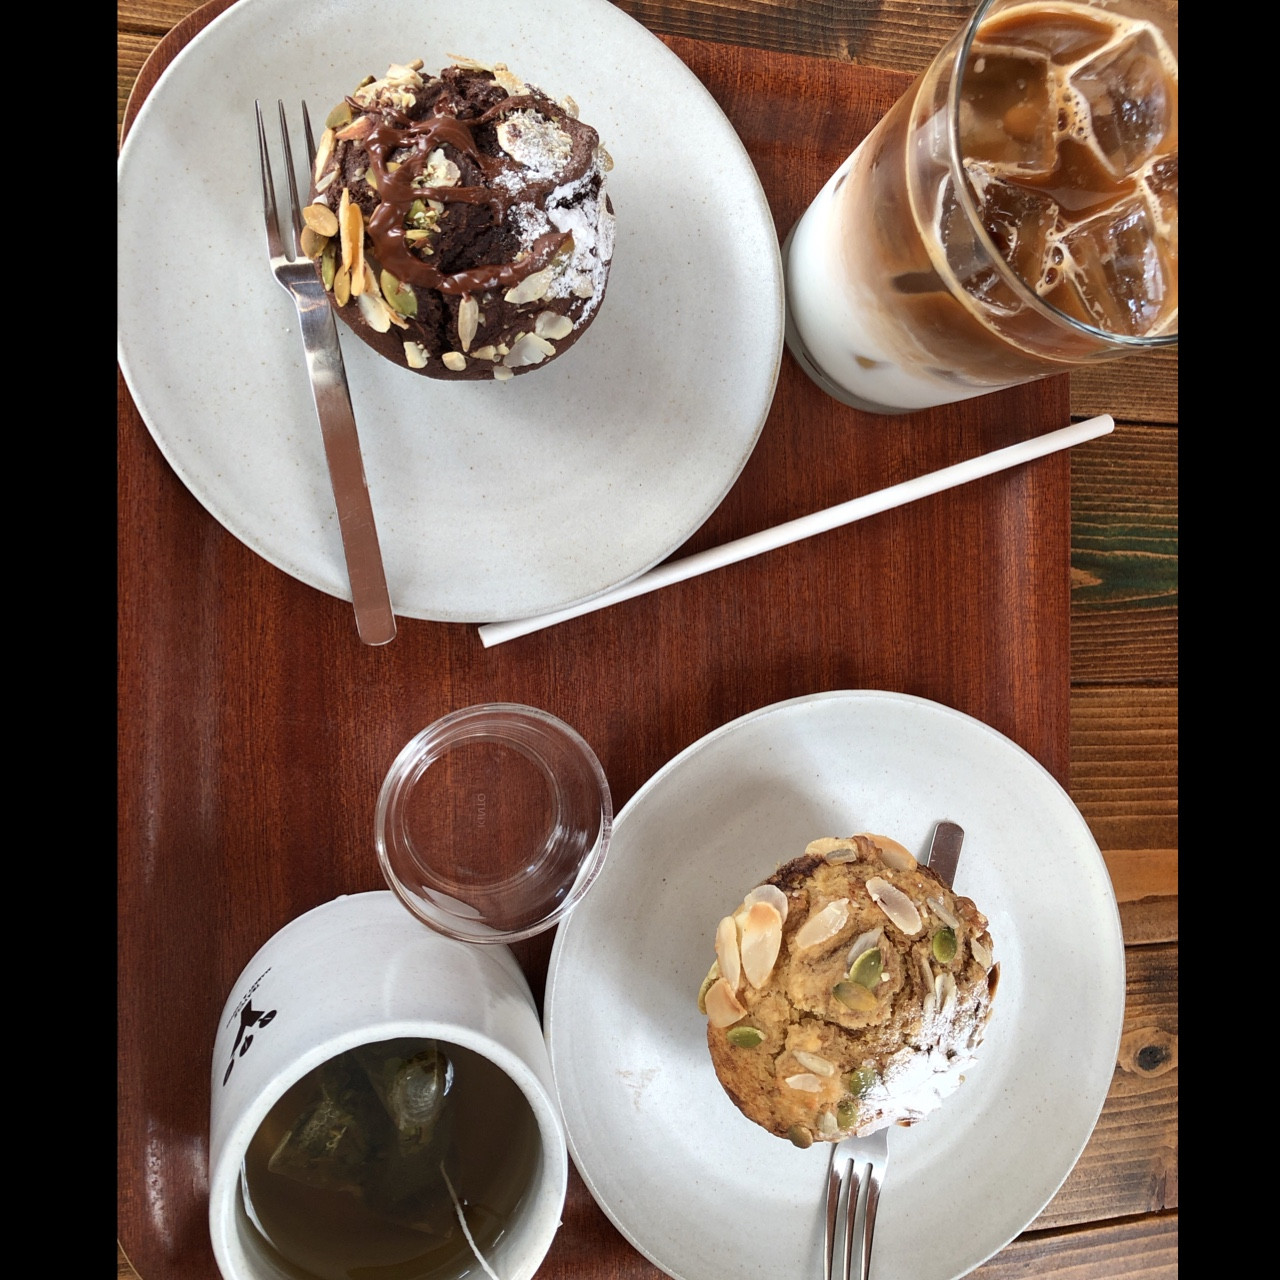 TRAYCLE Market & Coffee    トレイクルマーケット&カフェ>